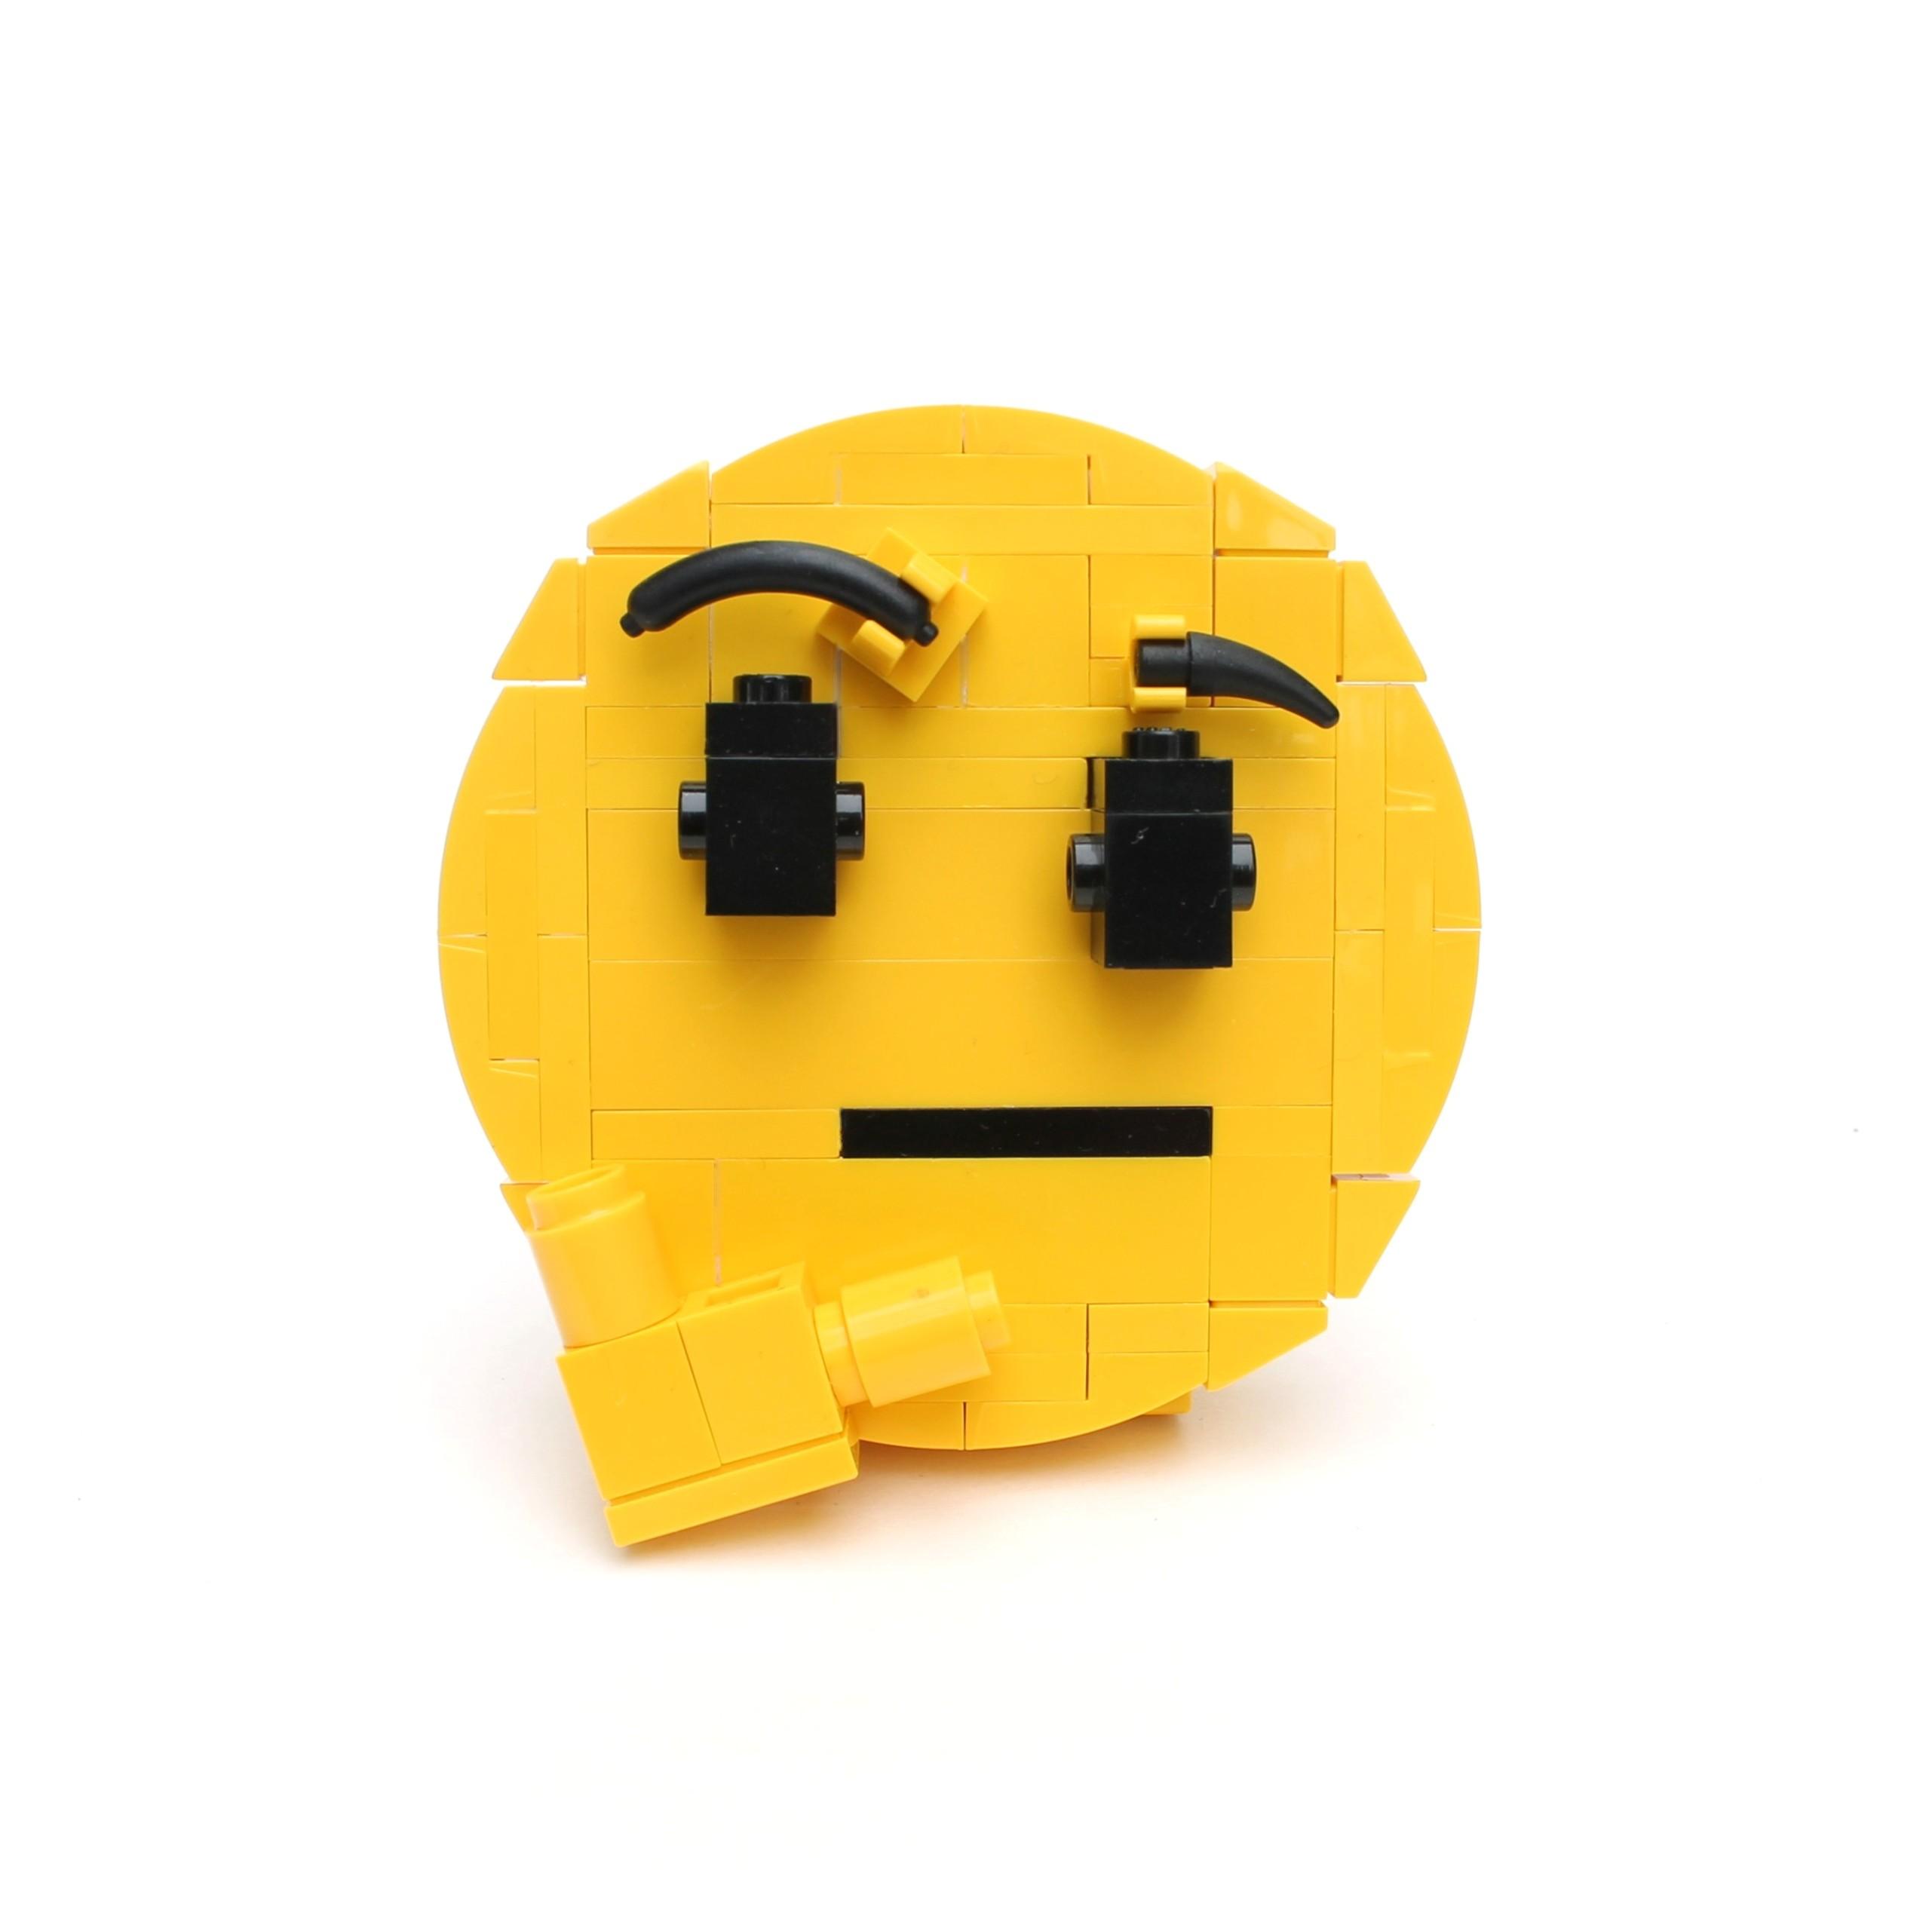 Brick-moji - Thinking face